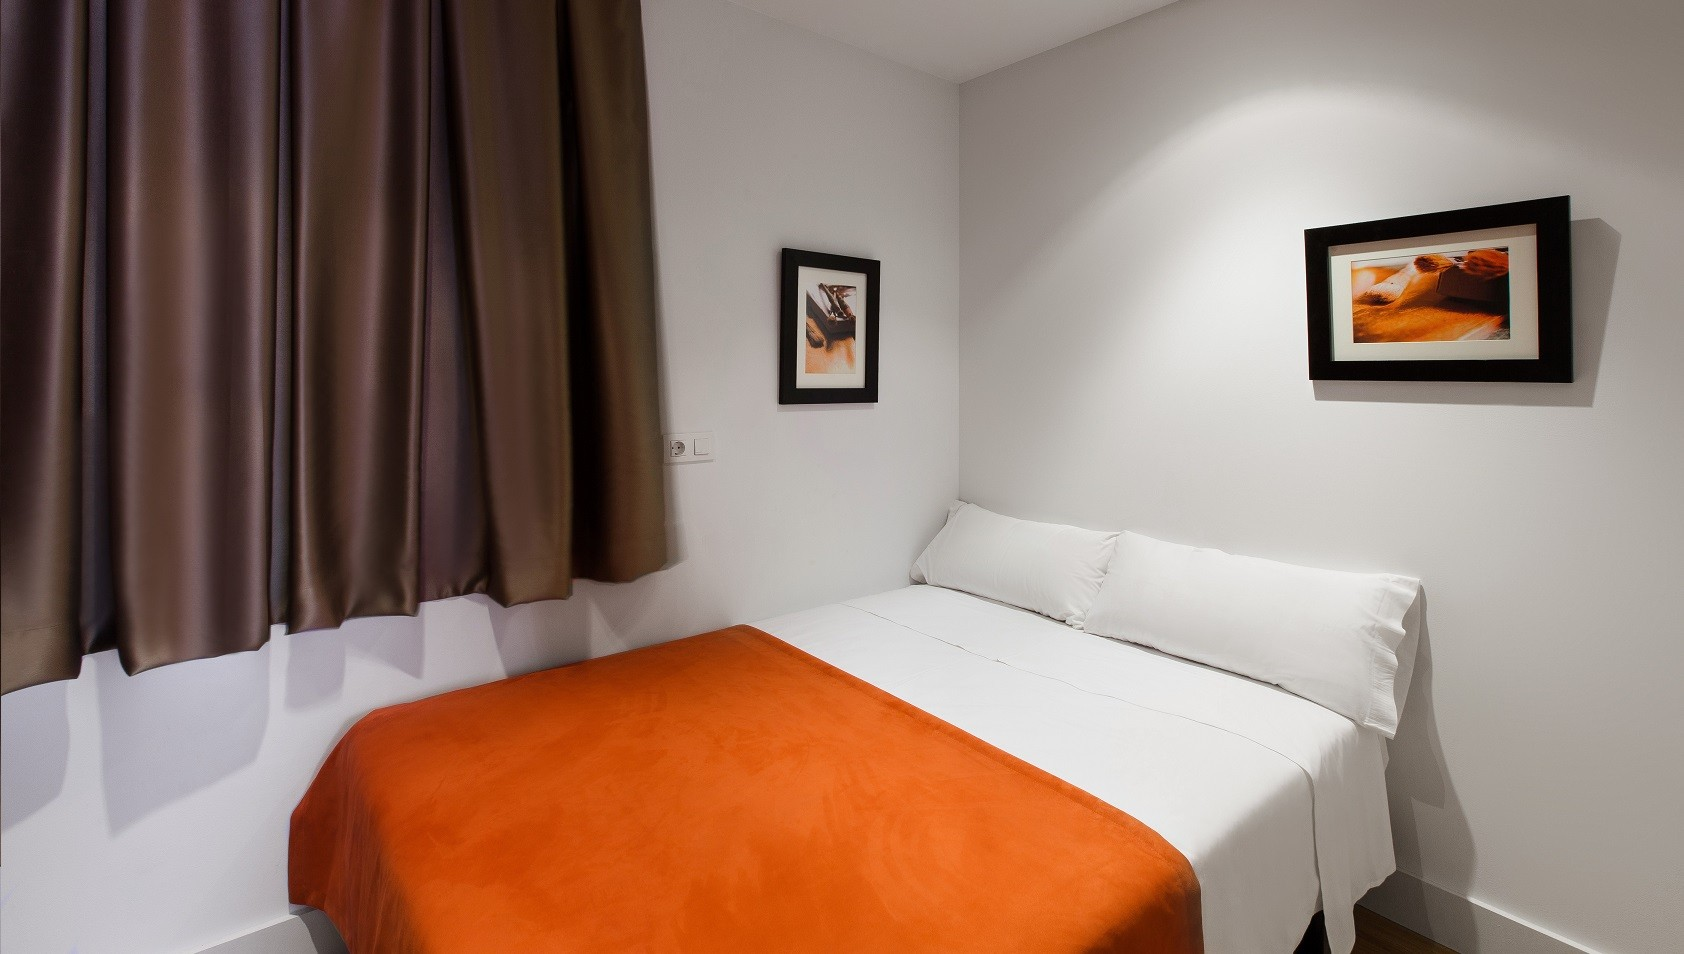 Dailyflats Sagrada Familia 1-bedroom (1-4 adults) Attic apartment in Barcelona 10